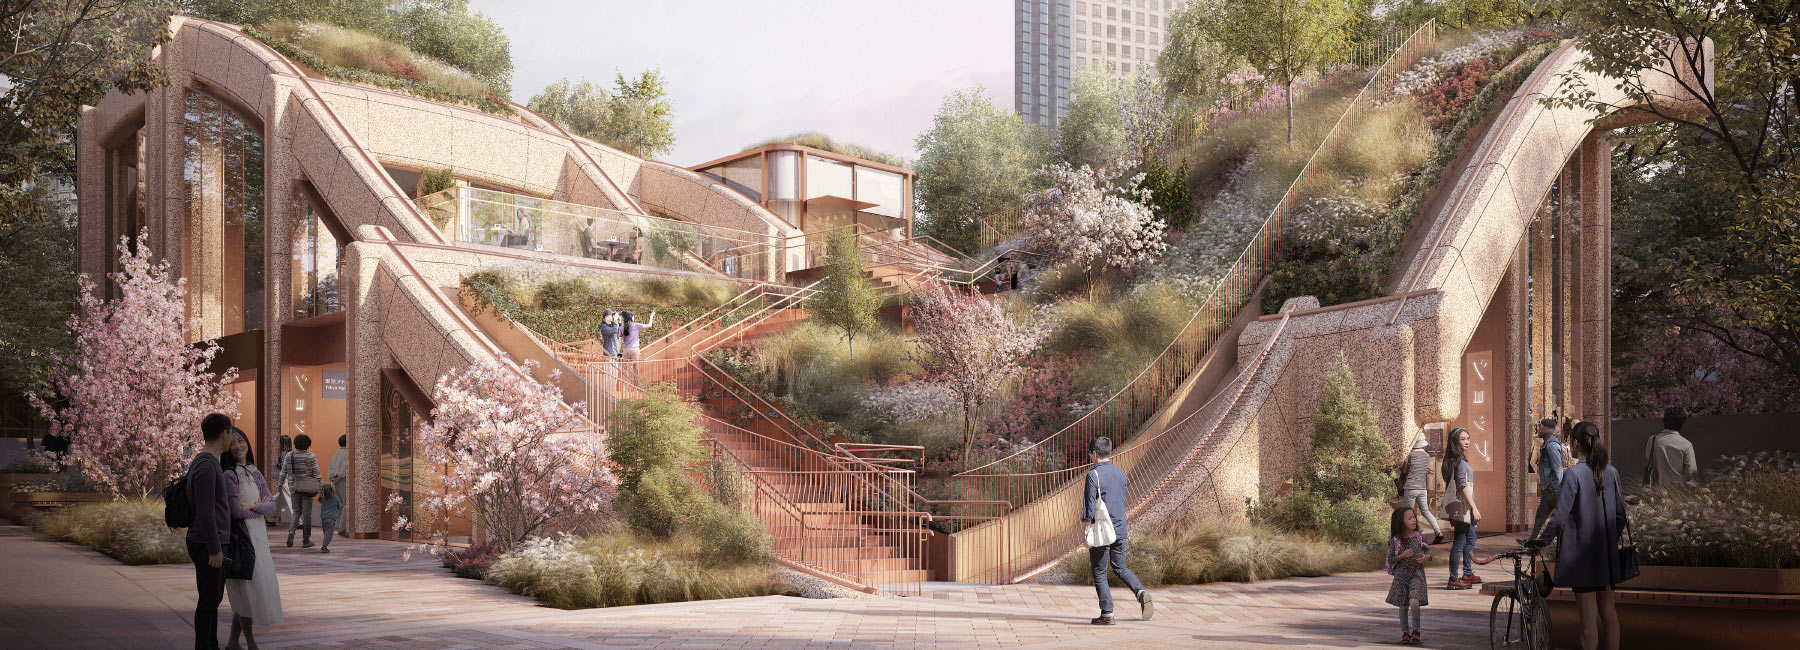 Heatherwick Studio Plans Planted Pergola For Tokyo